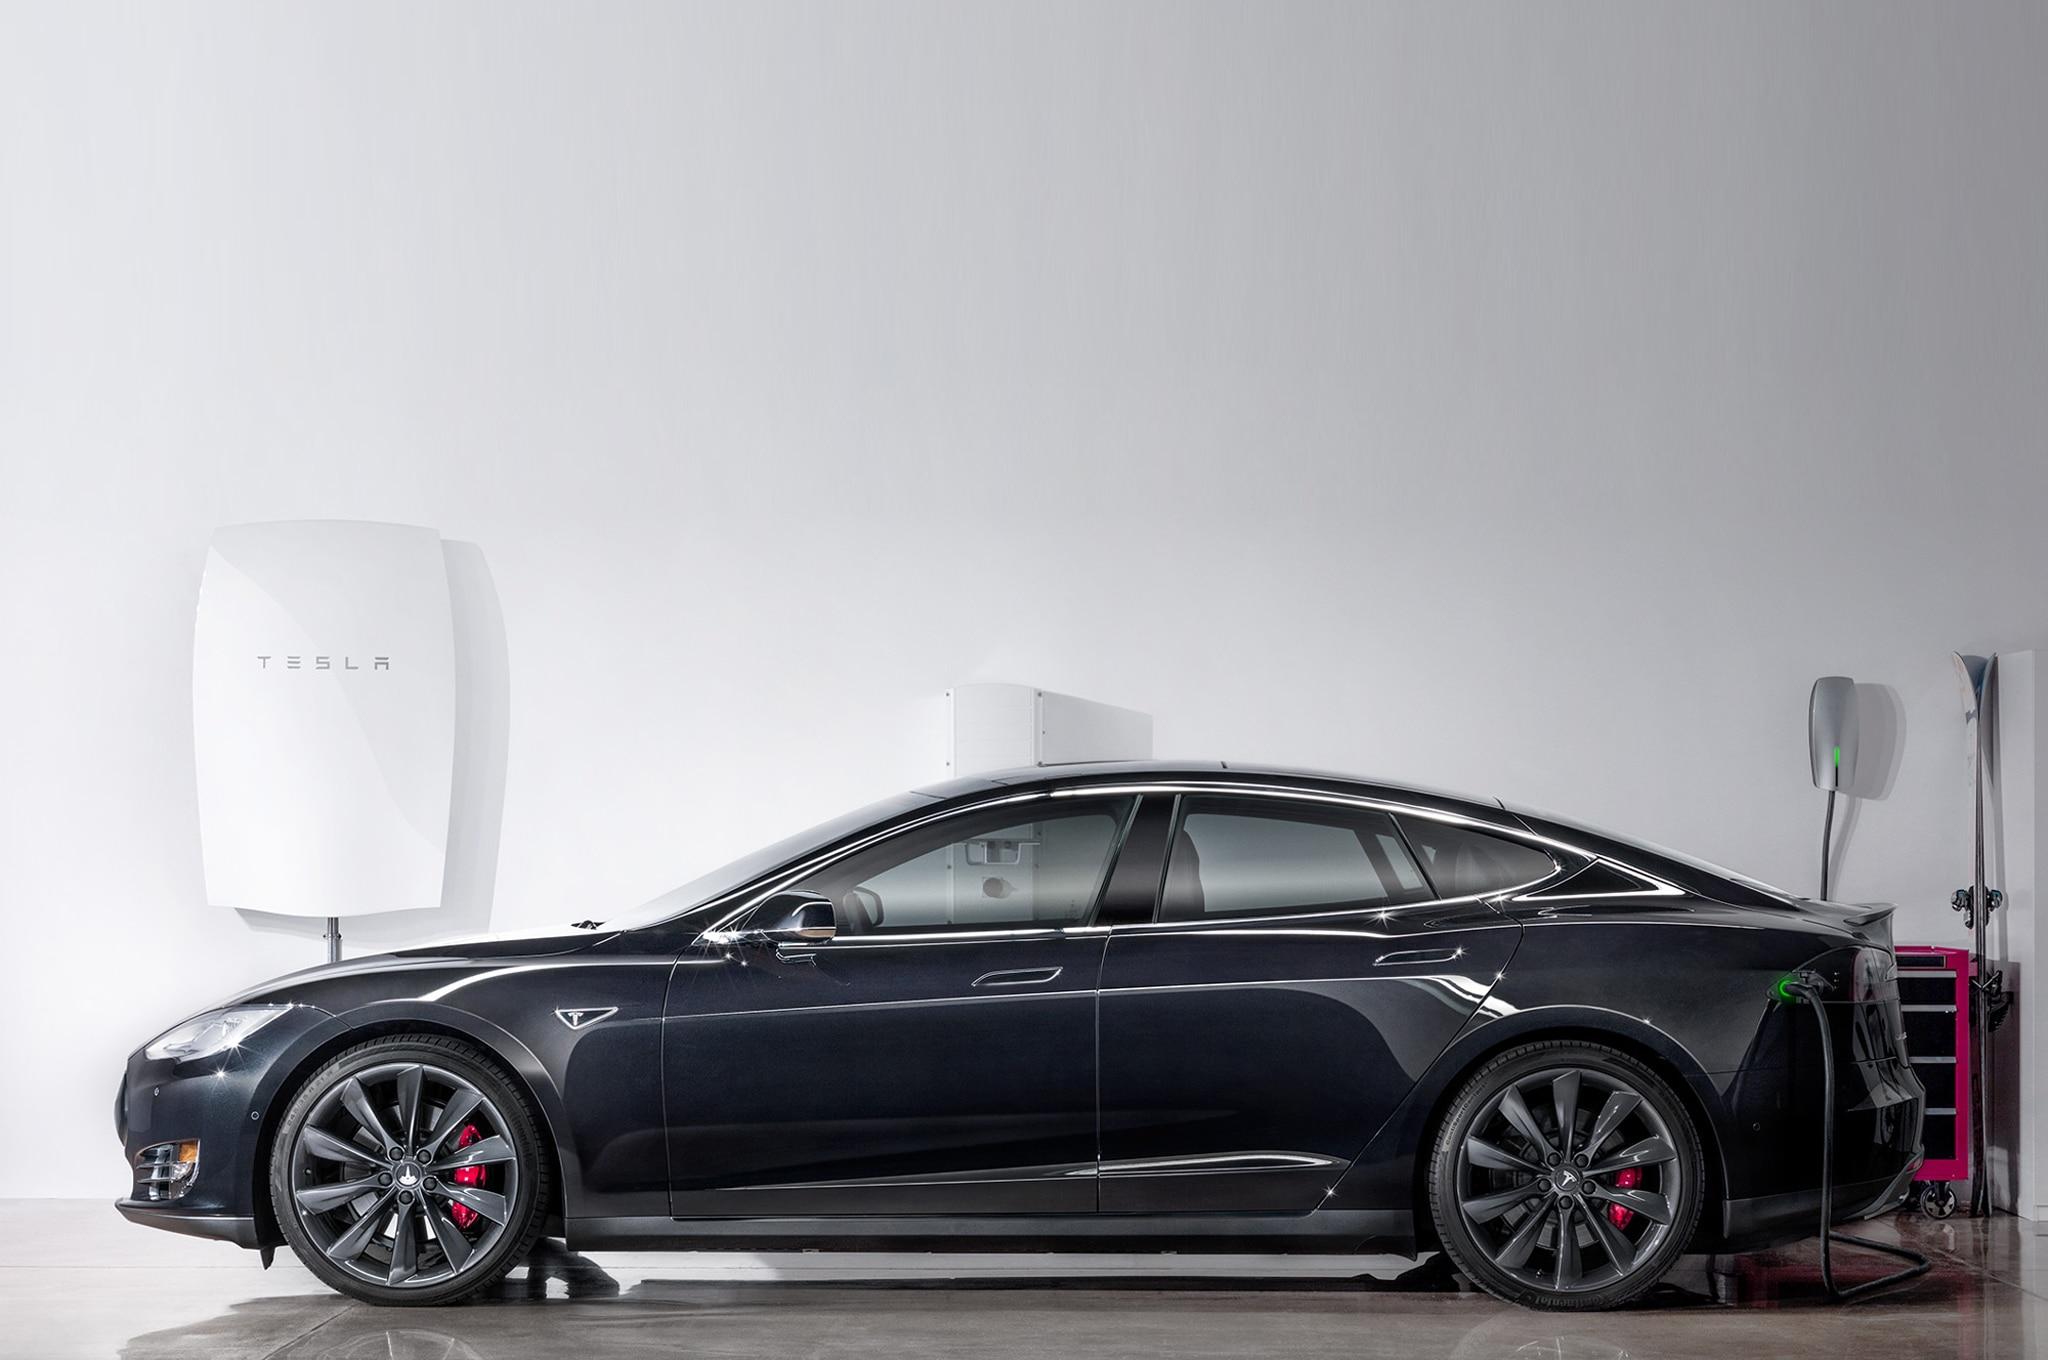 Tesla Powerwall With Model S